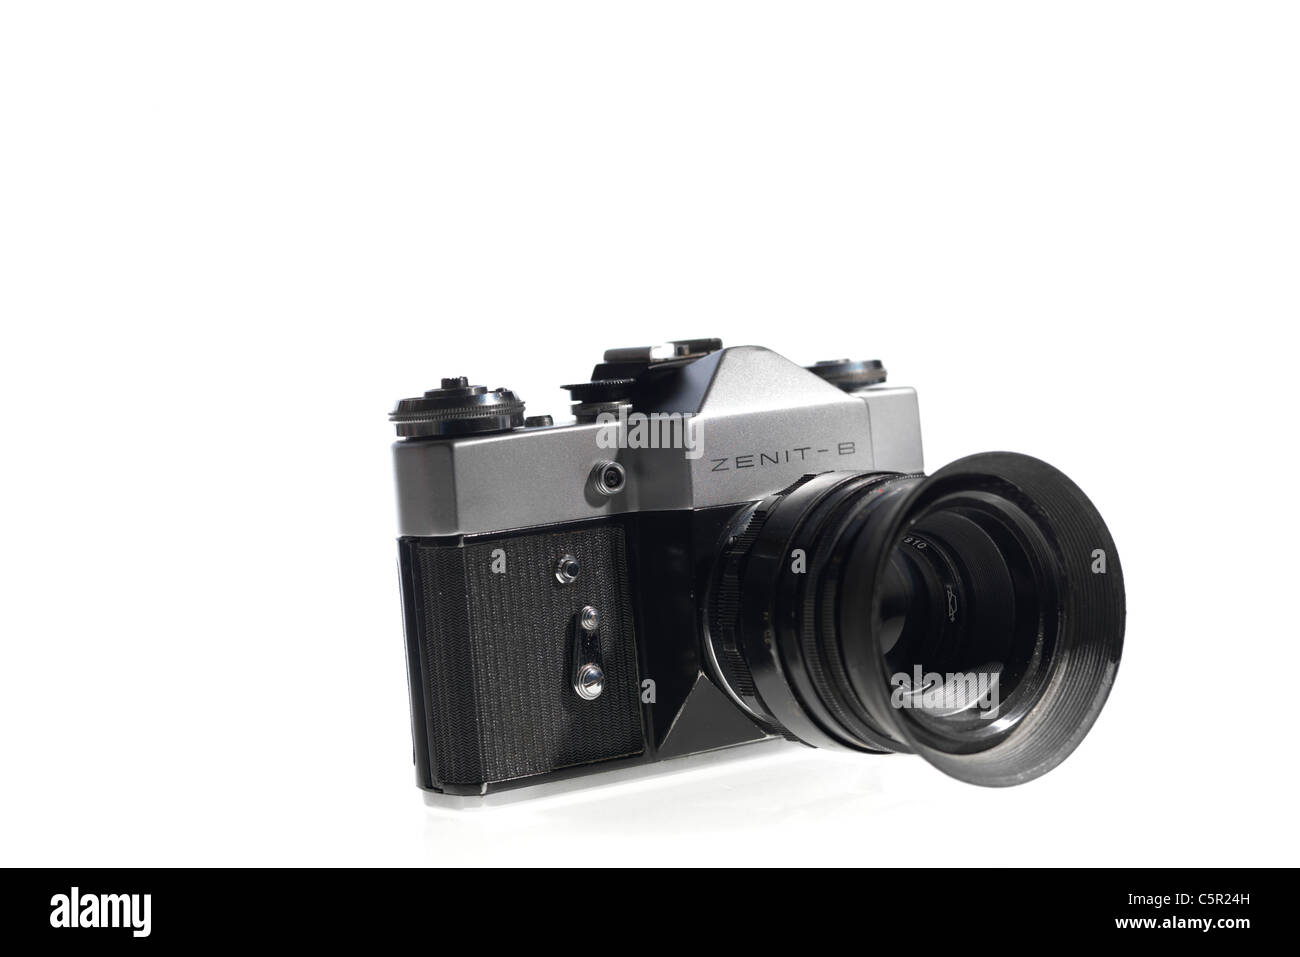 Old fashioned 'retro' Soviet era Zenith 35mm camera on white background - Stock Image